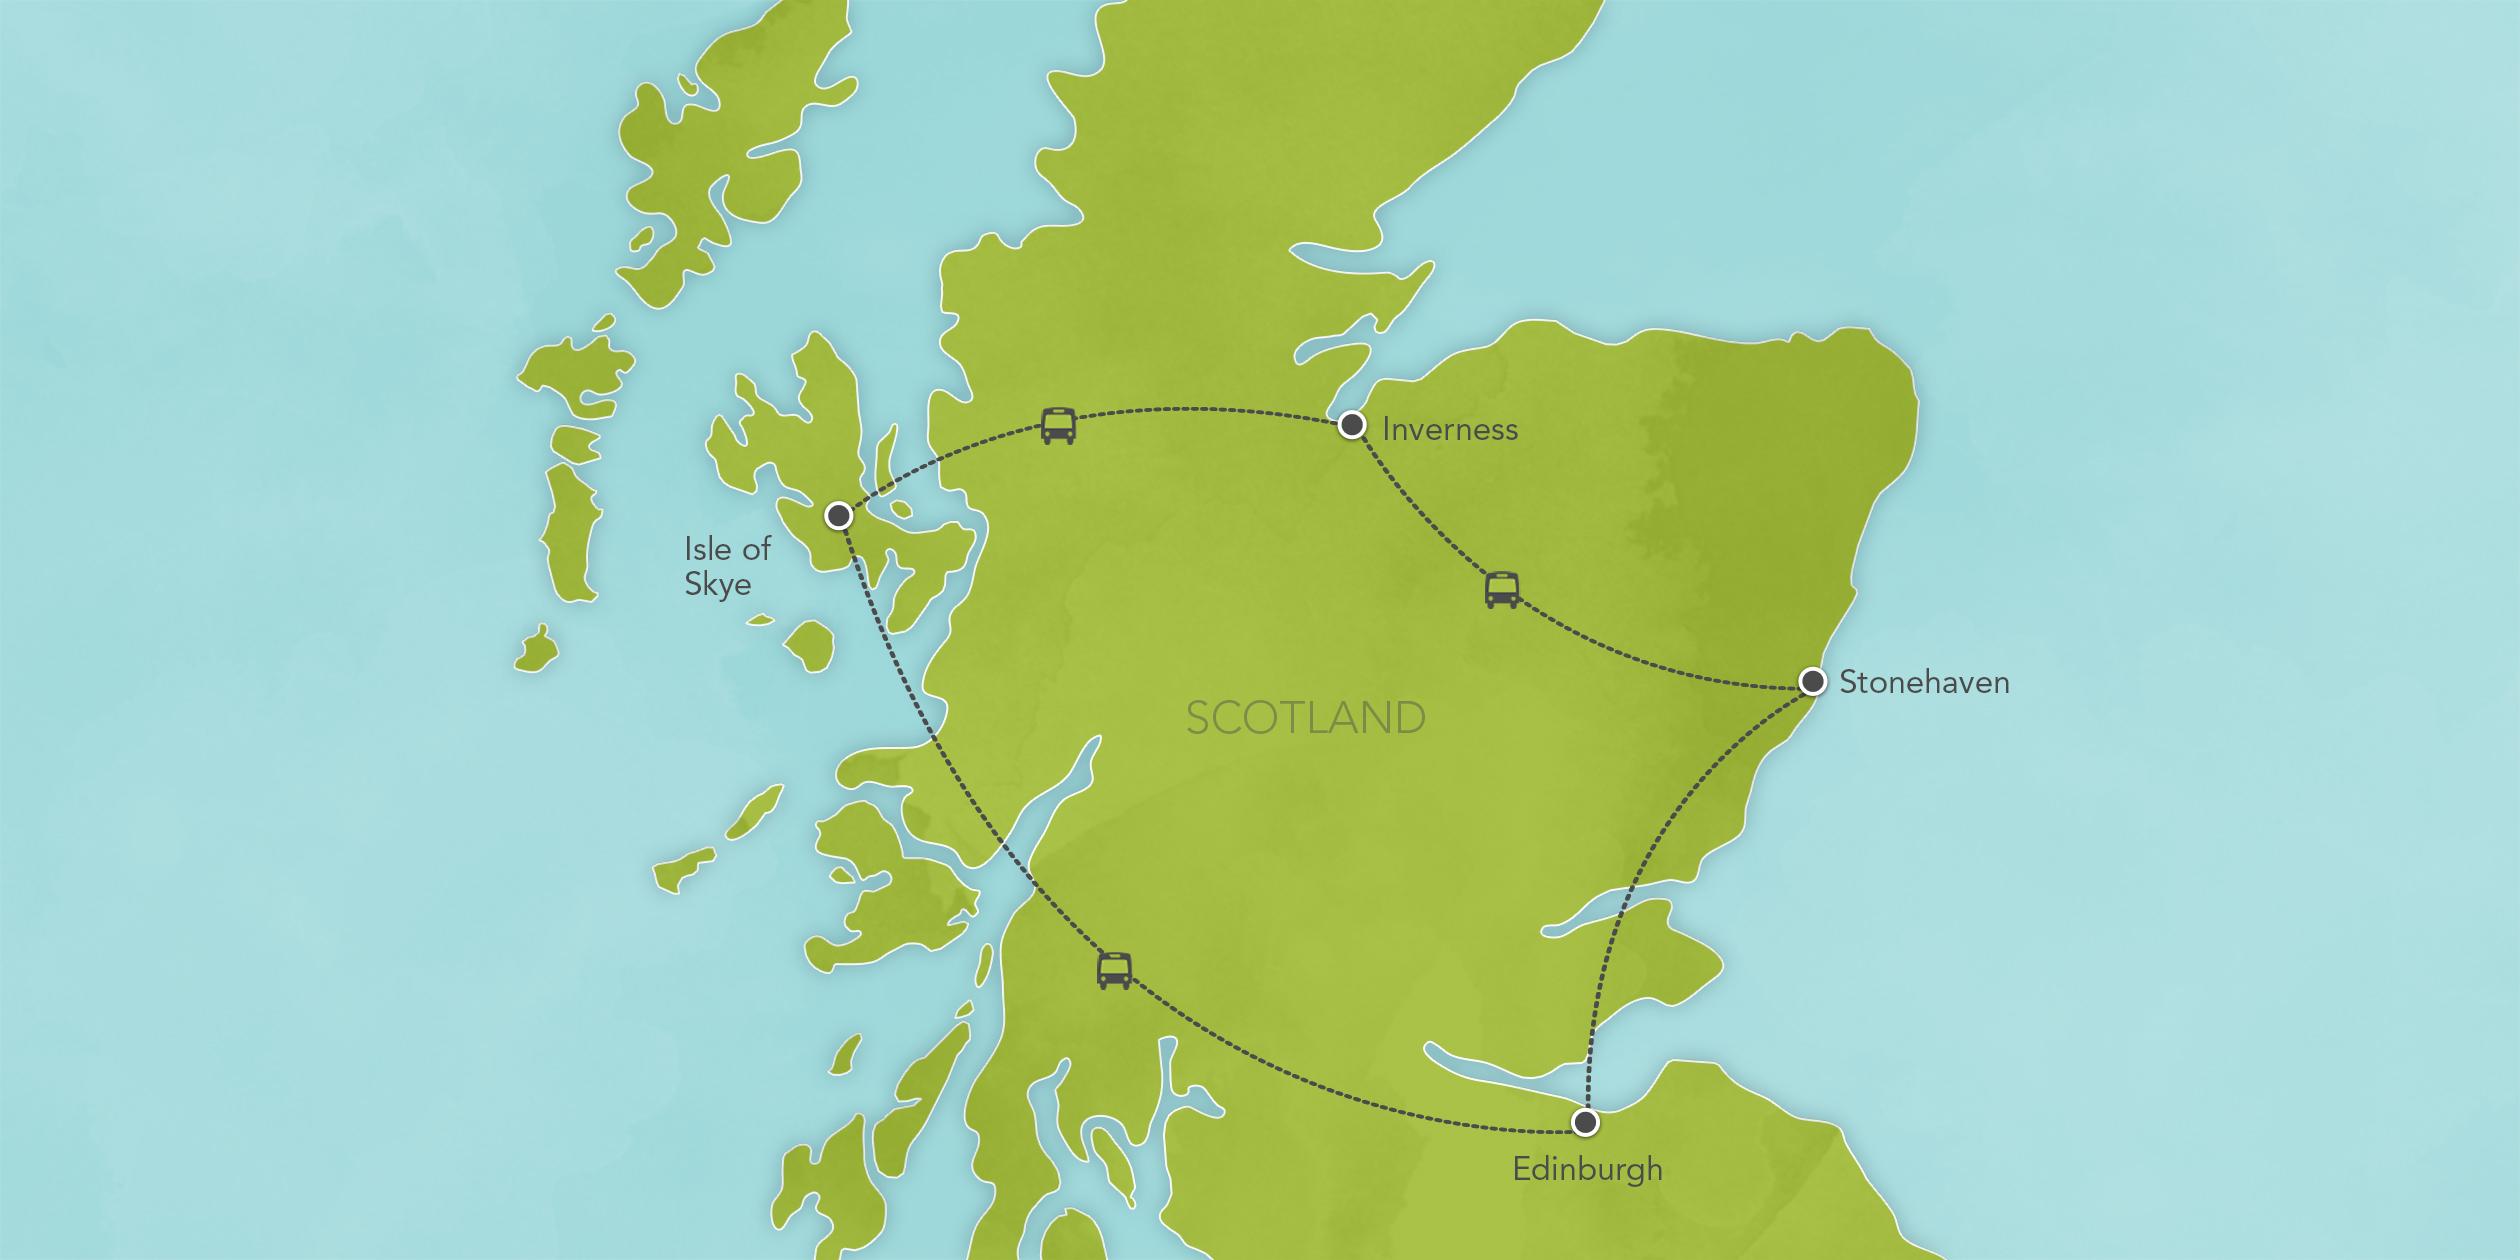 Itinerary map of Scotland: Loch Ness, Edinburgh, Inverness, Isle of Skye 2017